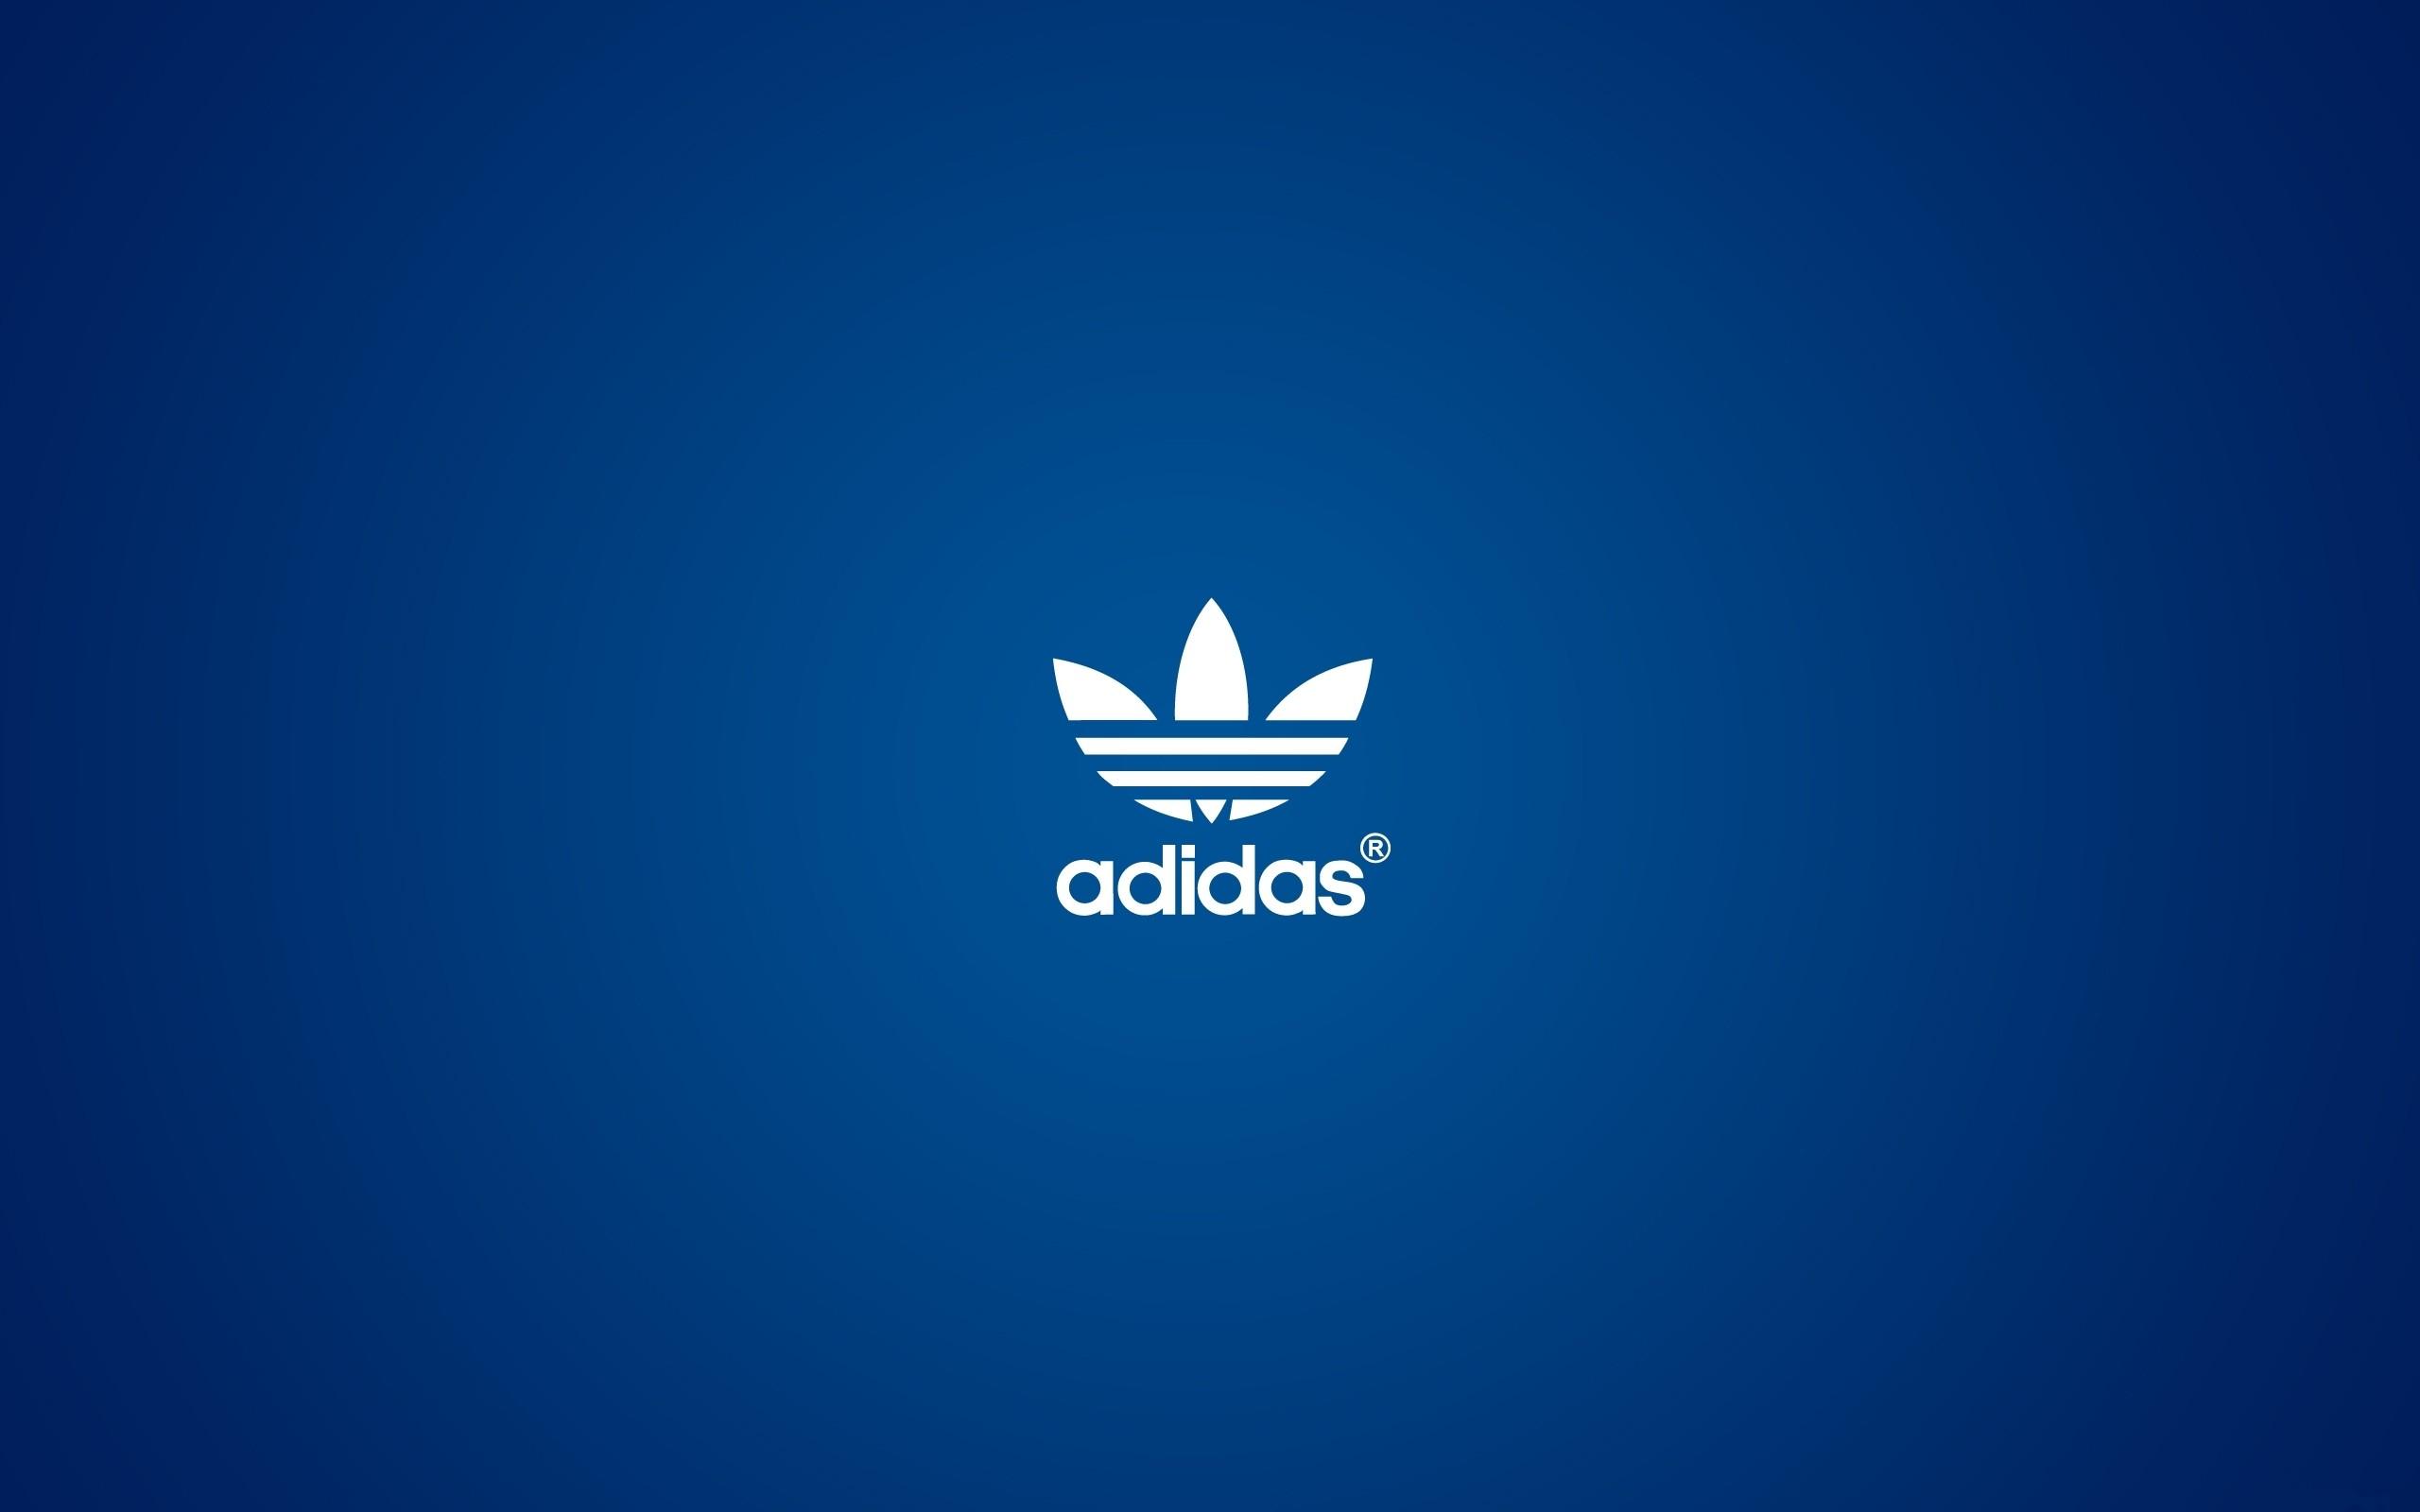 Sports, adidas, brand clothes wallpaper – ForWallpaper.com